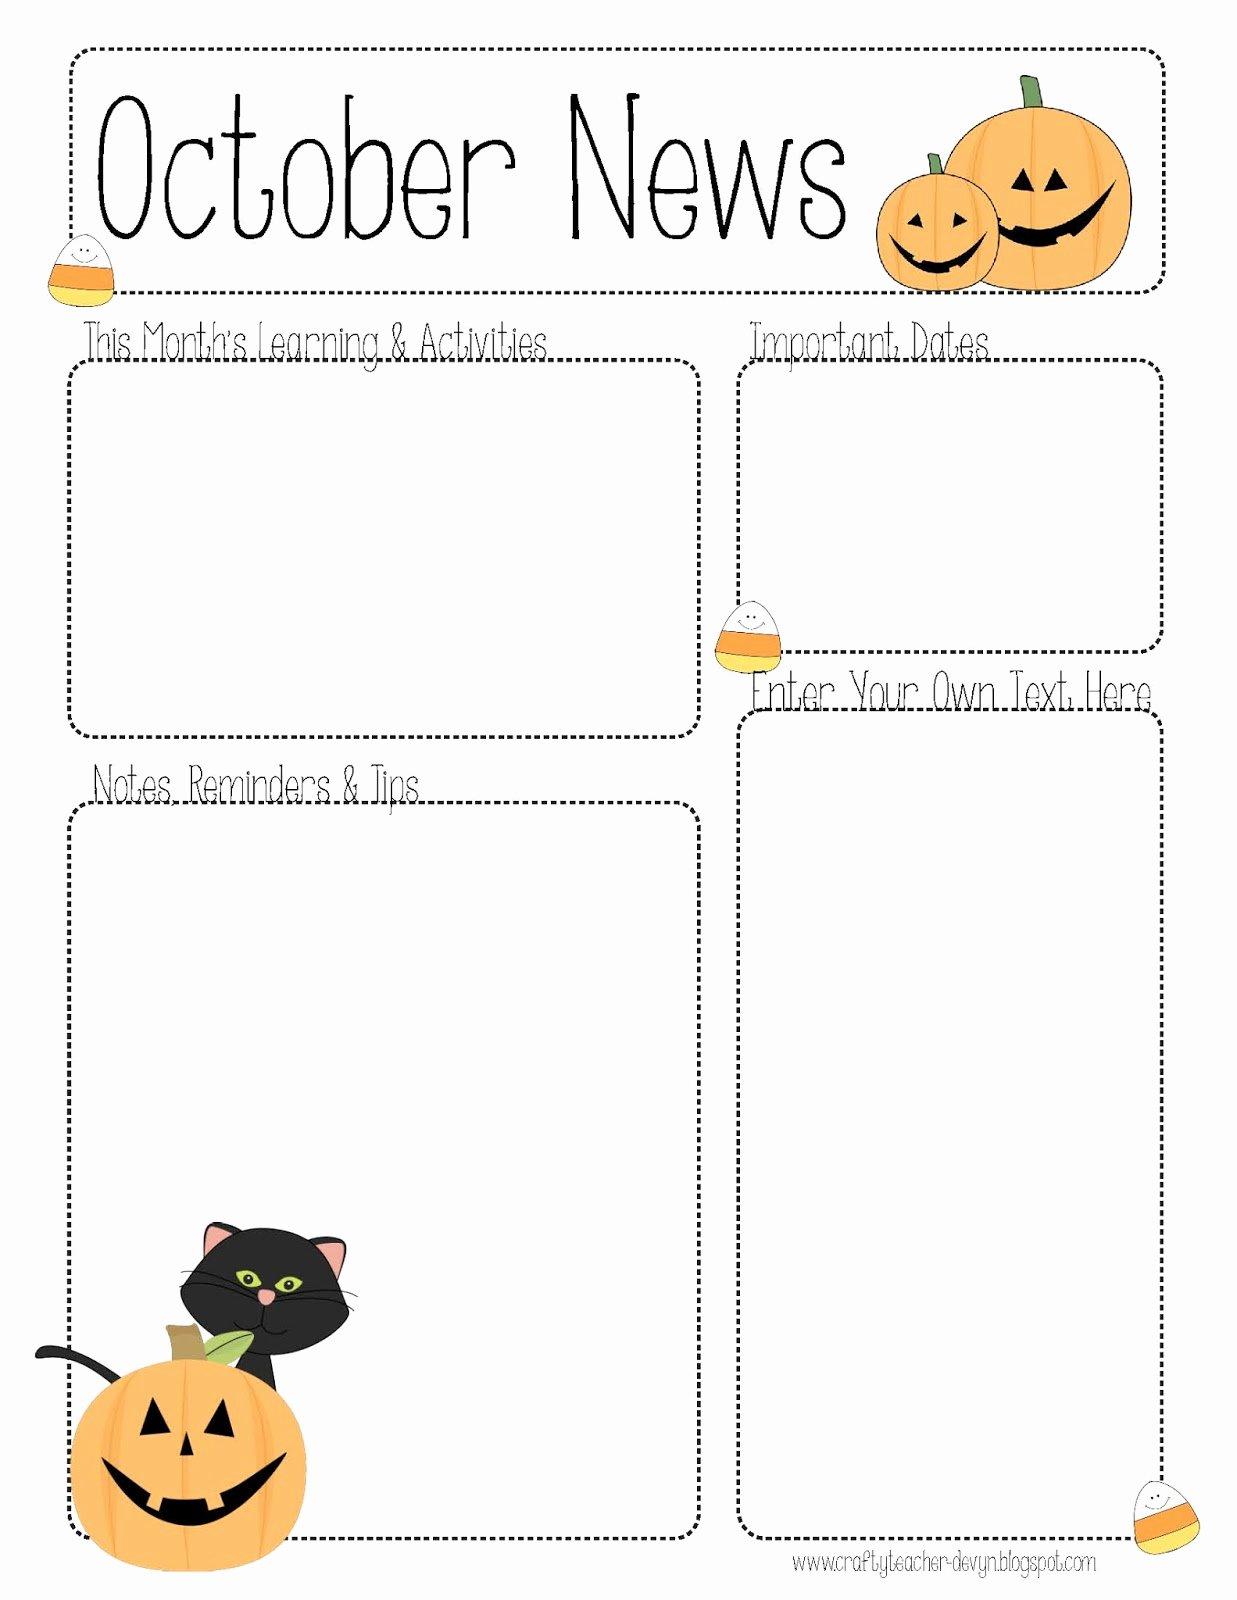 October Newsletter Template